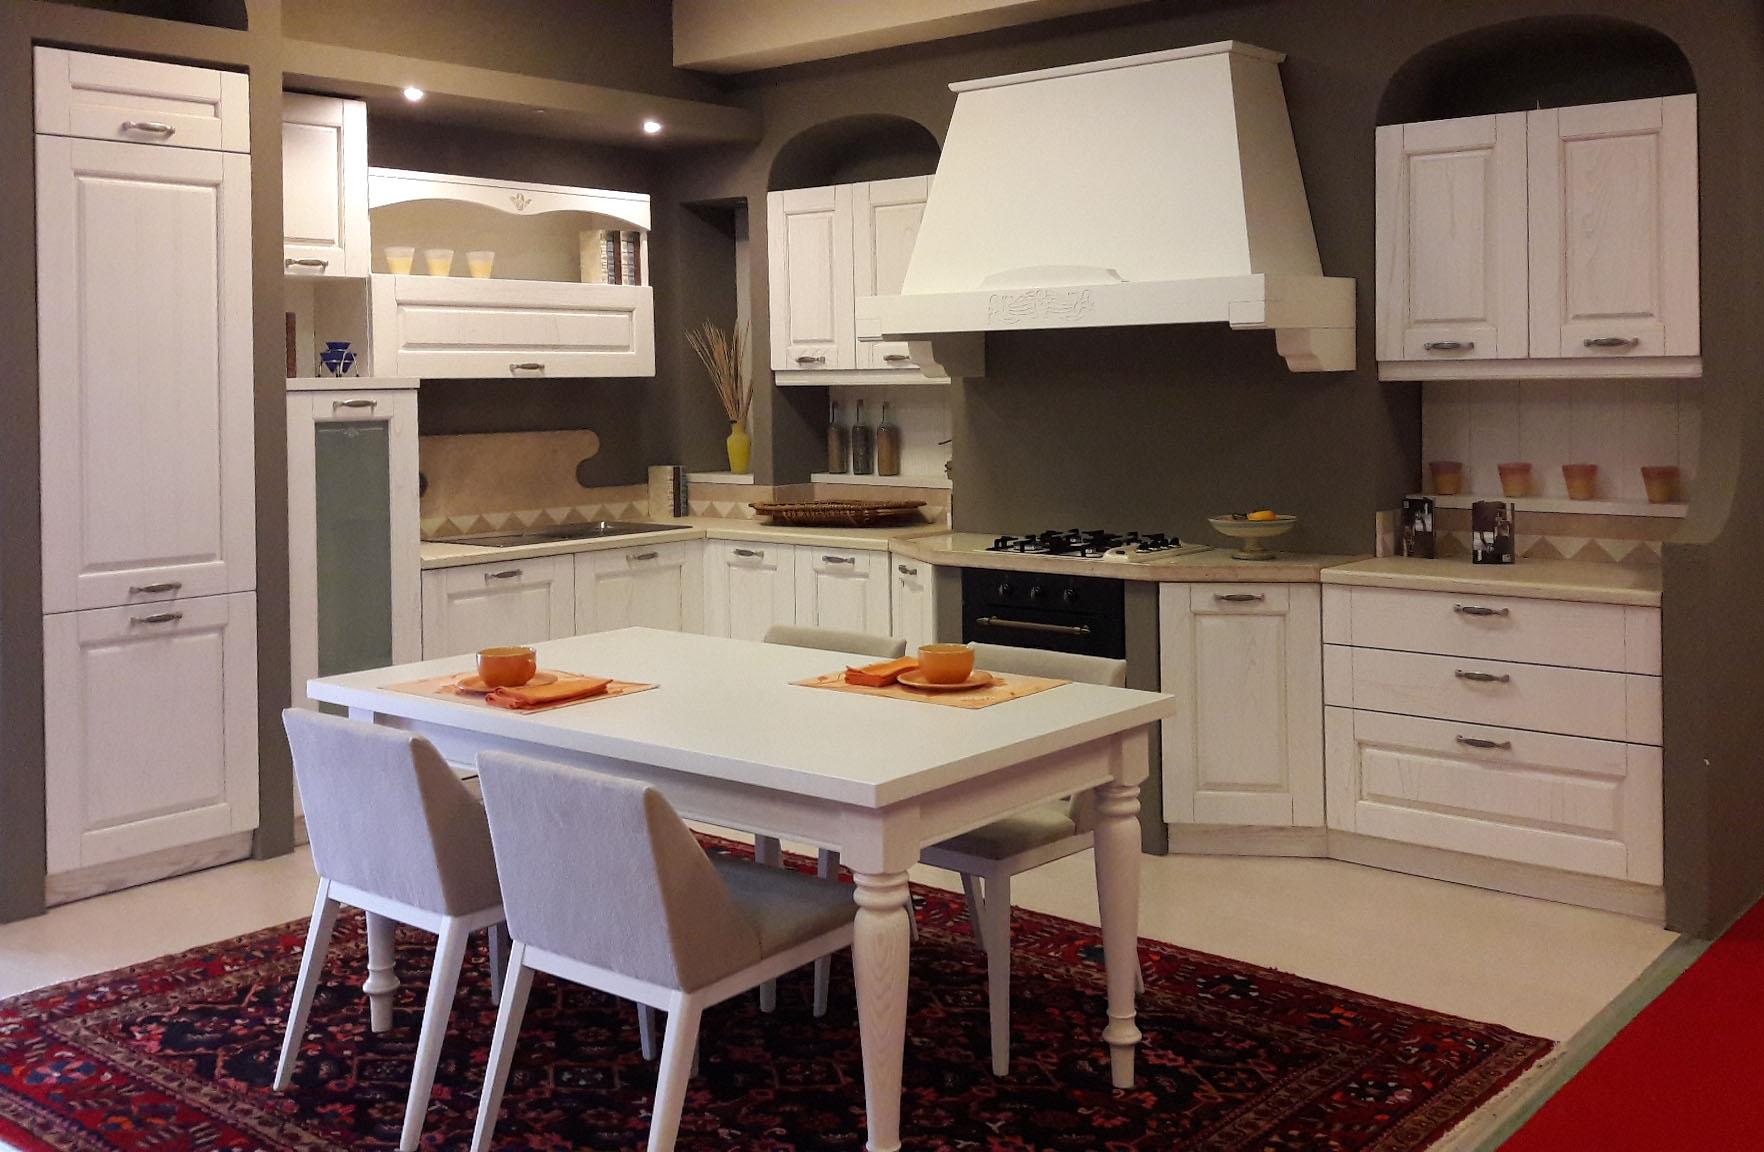 Cucina arredo3 verona scontato del 50 cucine a prezzi for Cucine outlet verona